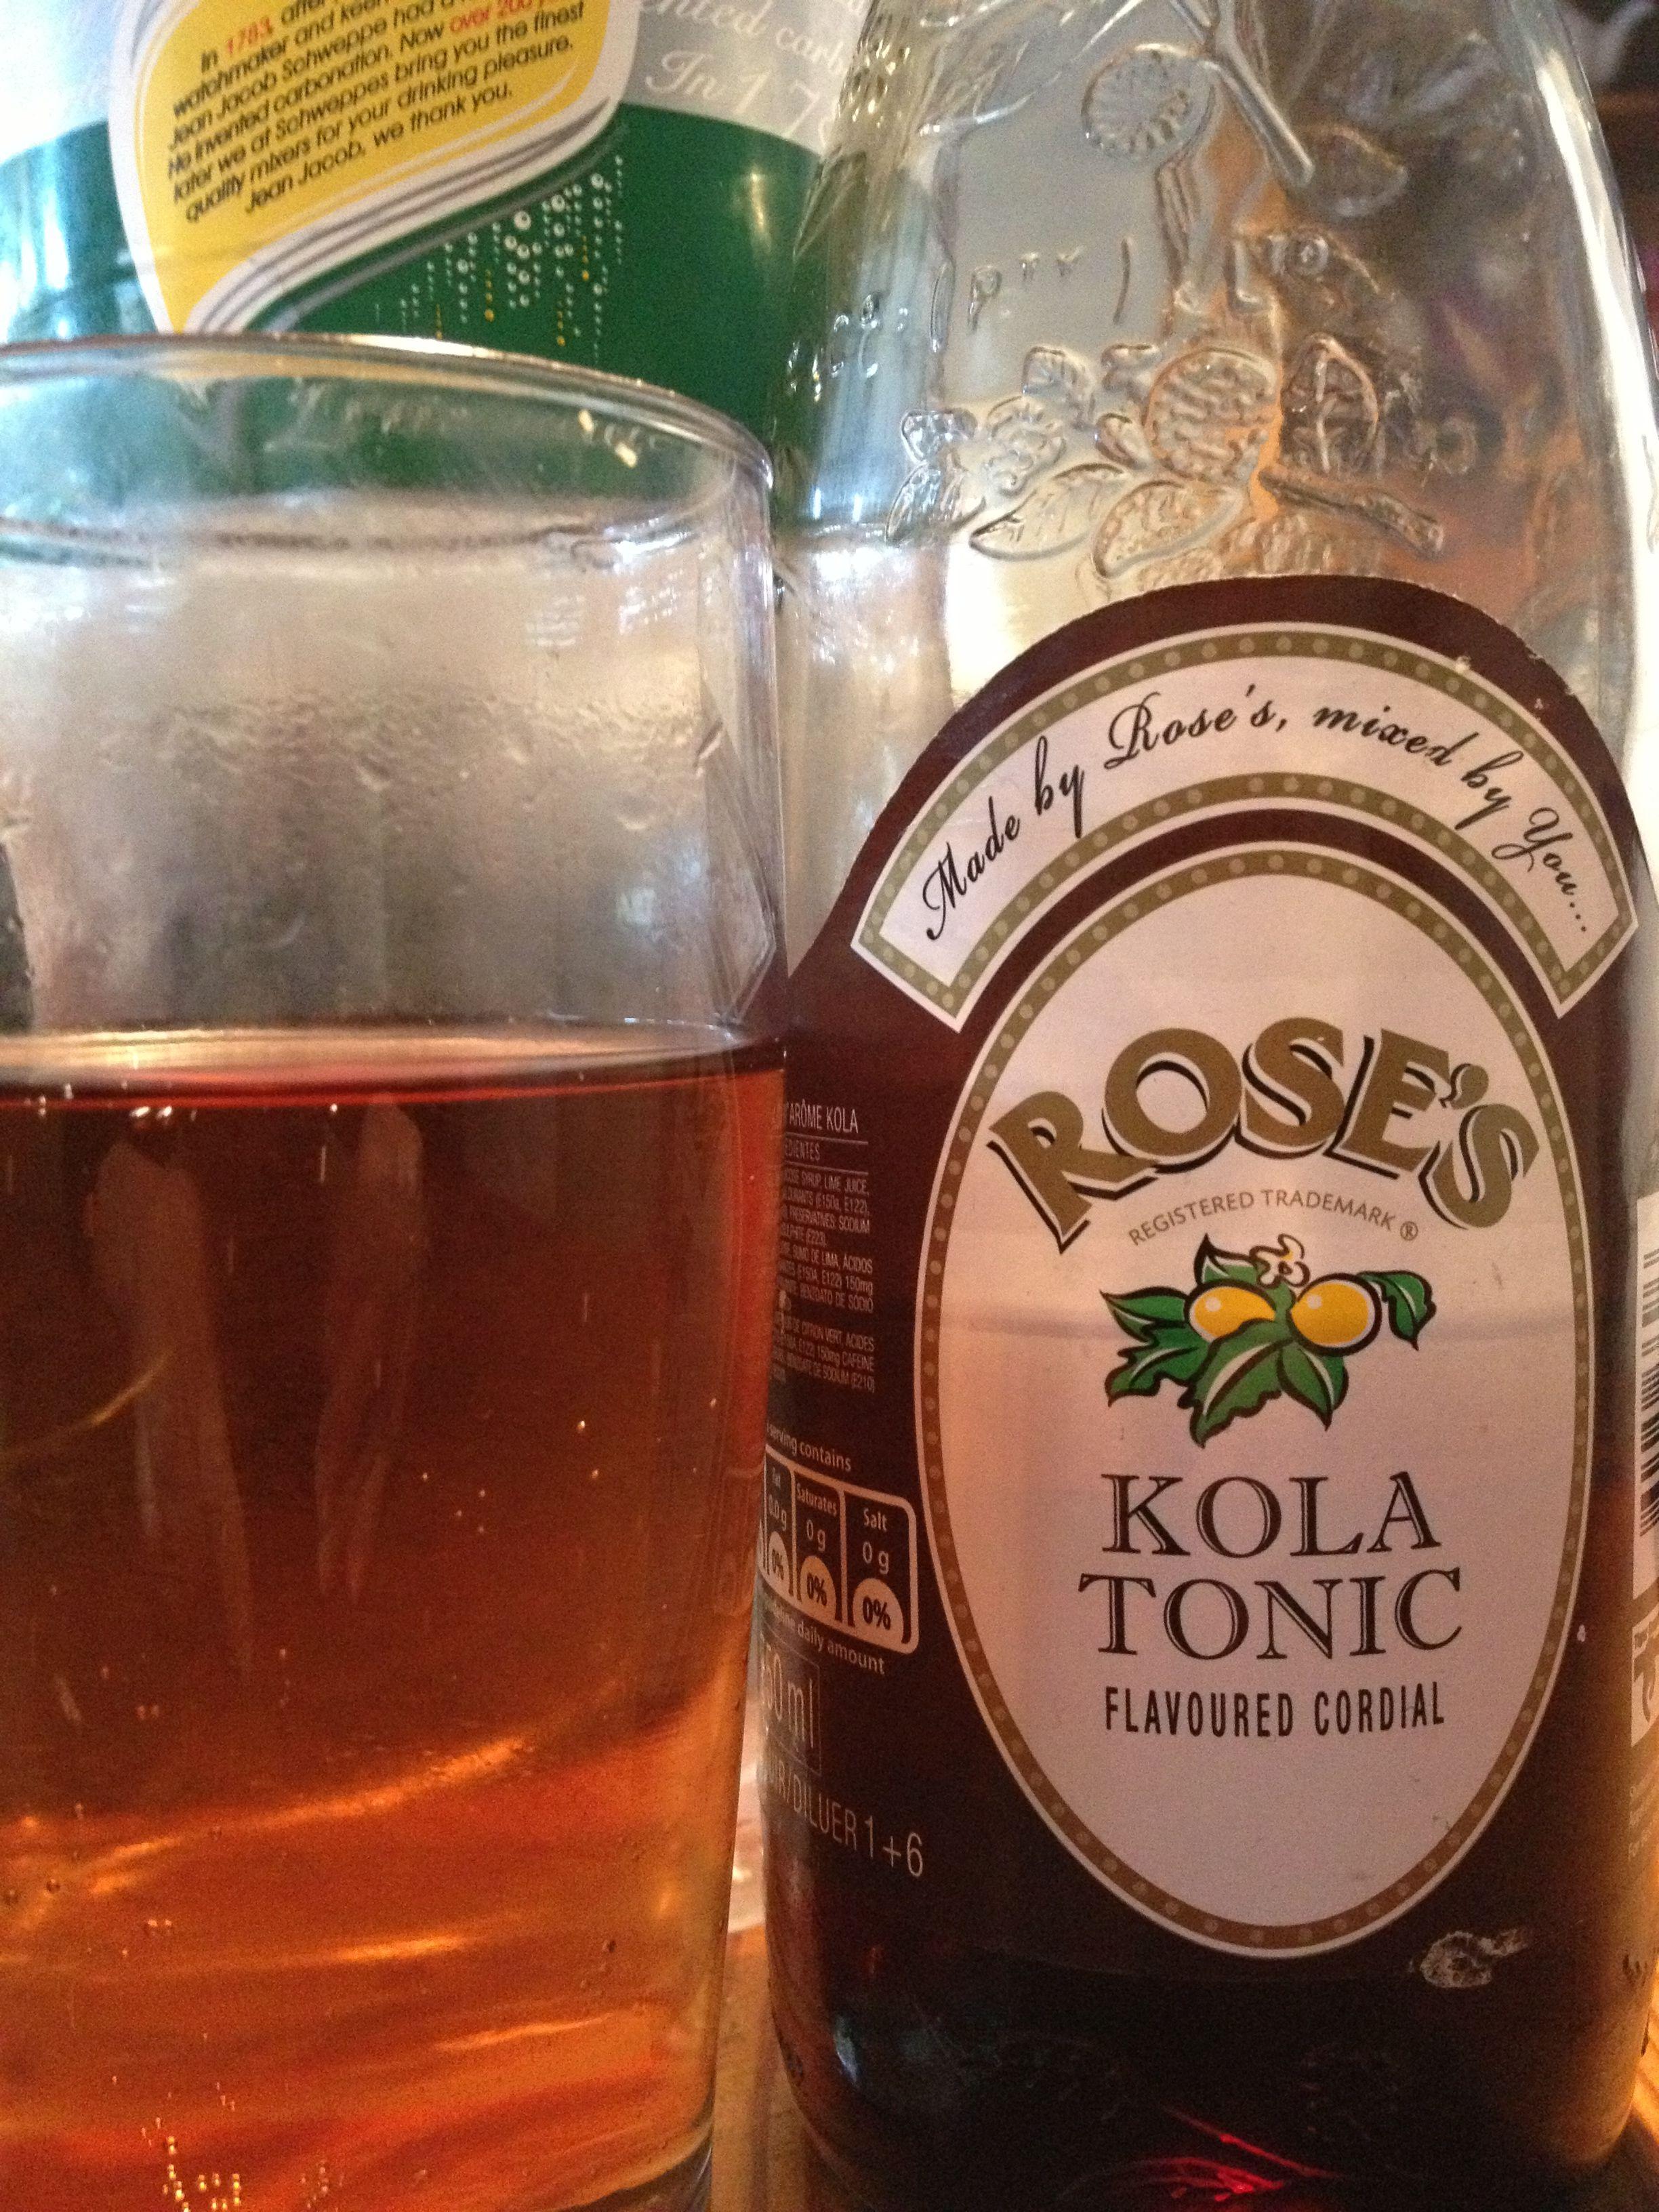 KOLA TONIC & LEMONADE - Refreshing non-alcoholic drink, enjoyed in